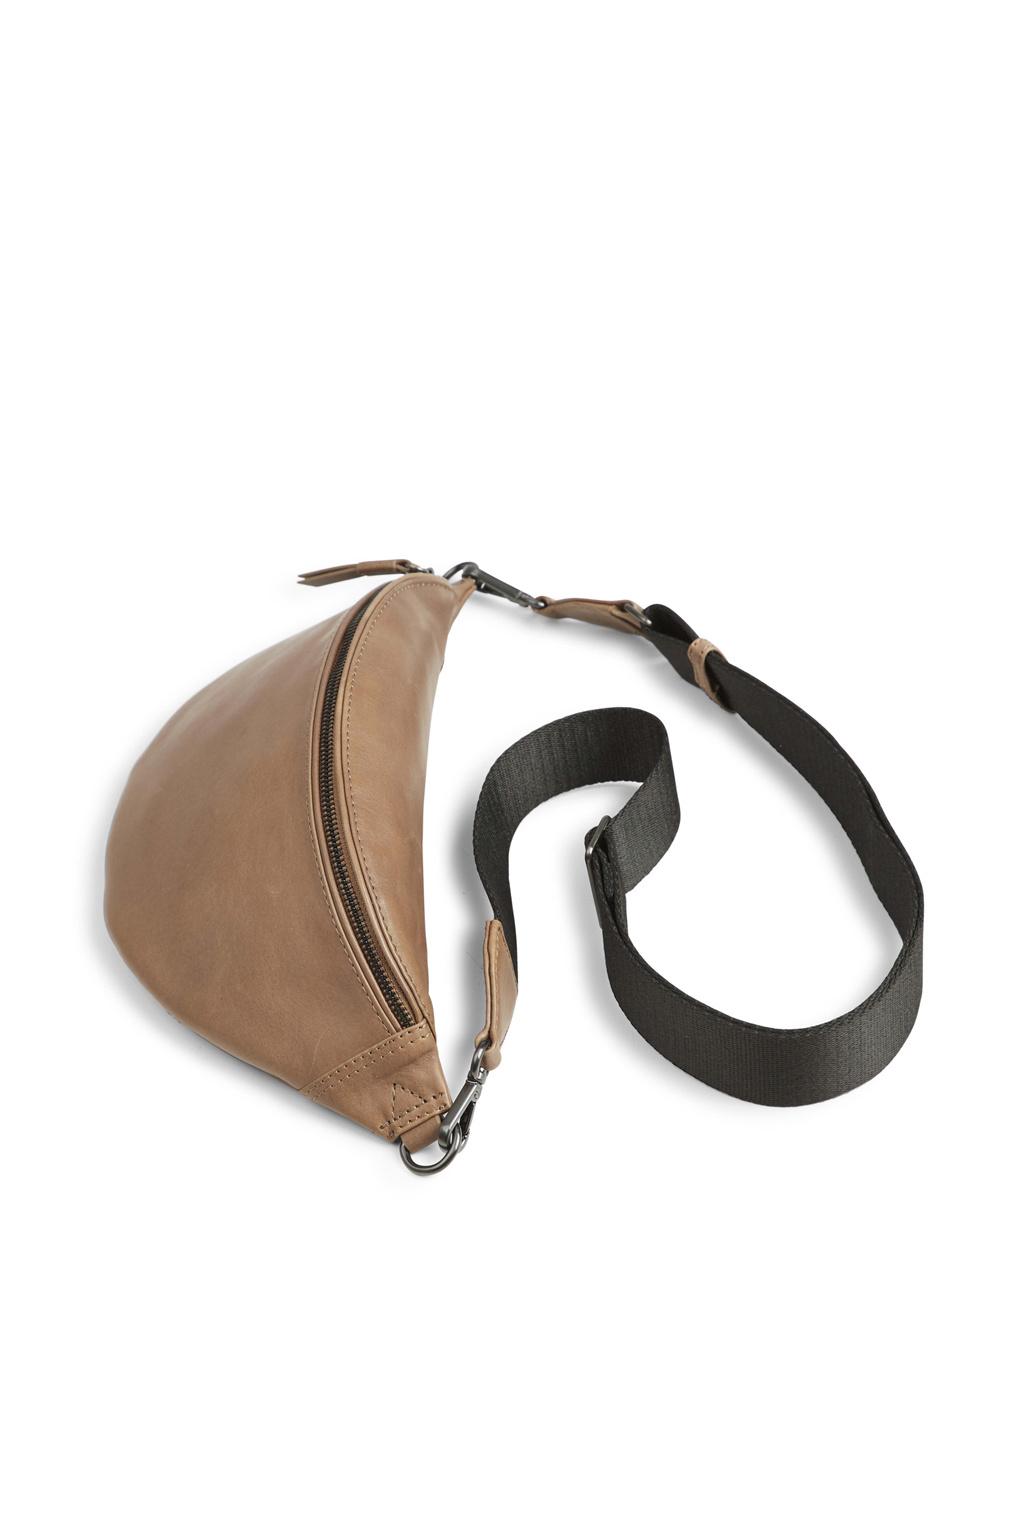 Elinor Bum Bag - Antique Caramel w/ Black-2